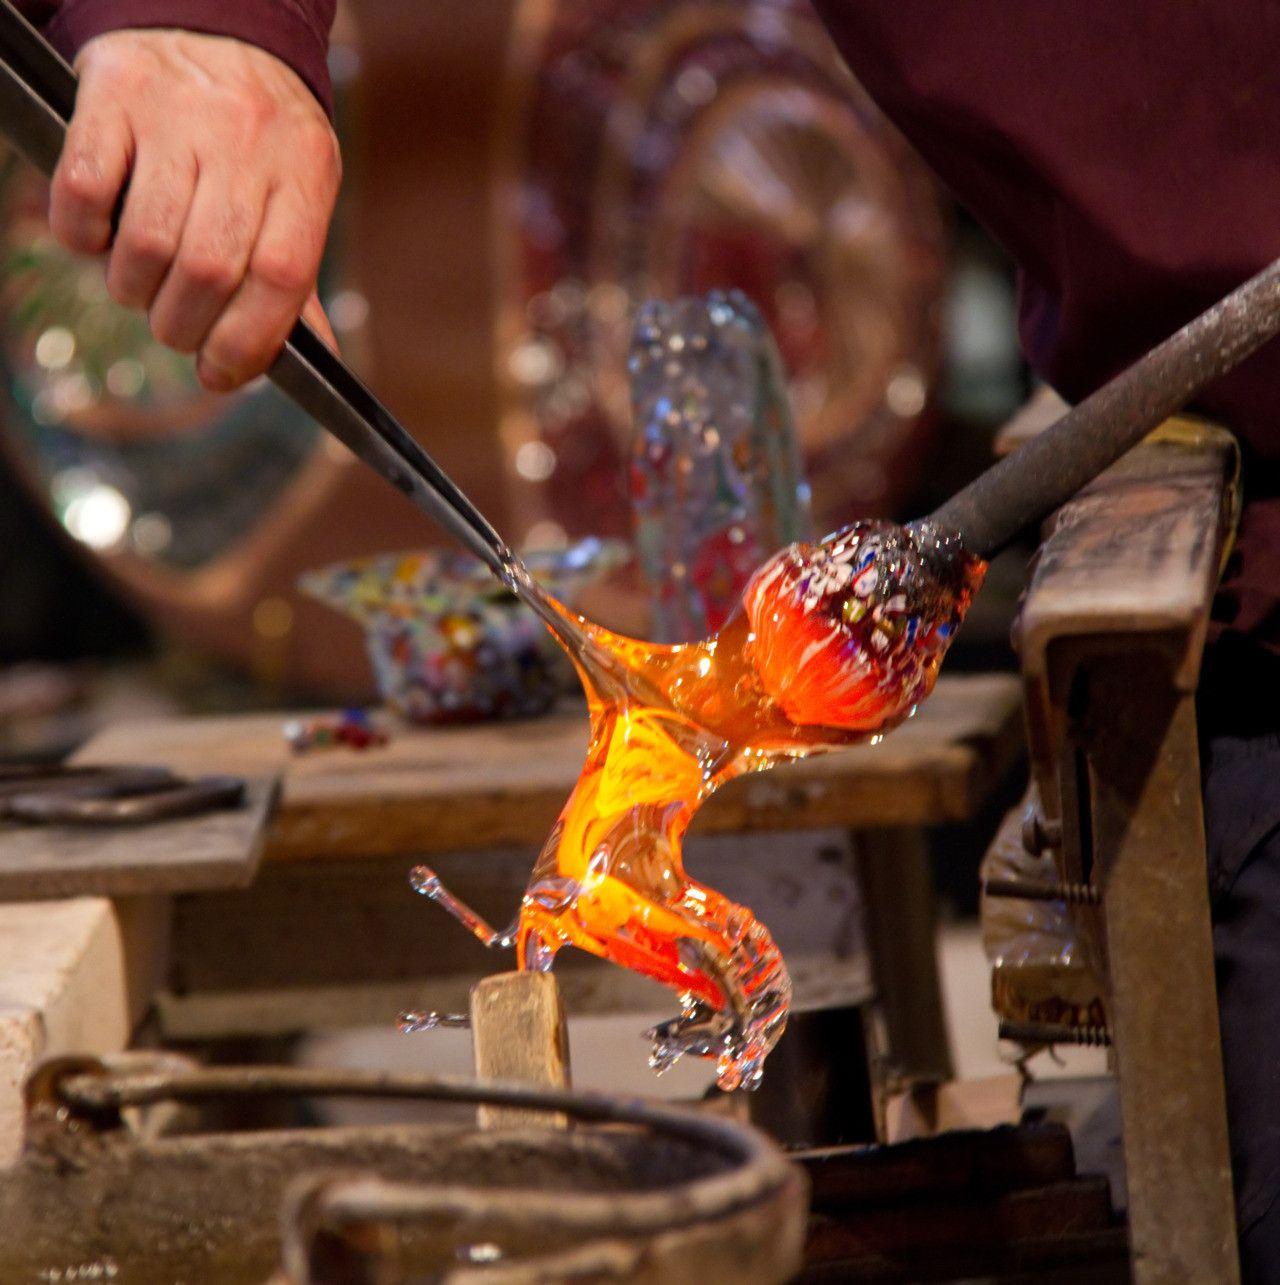 Making A Glass Horse Glass Blowing Venetian Glass Making Glass